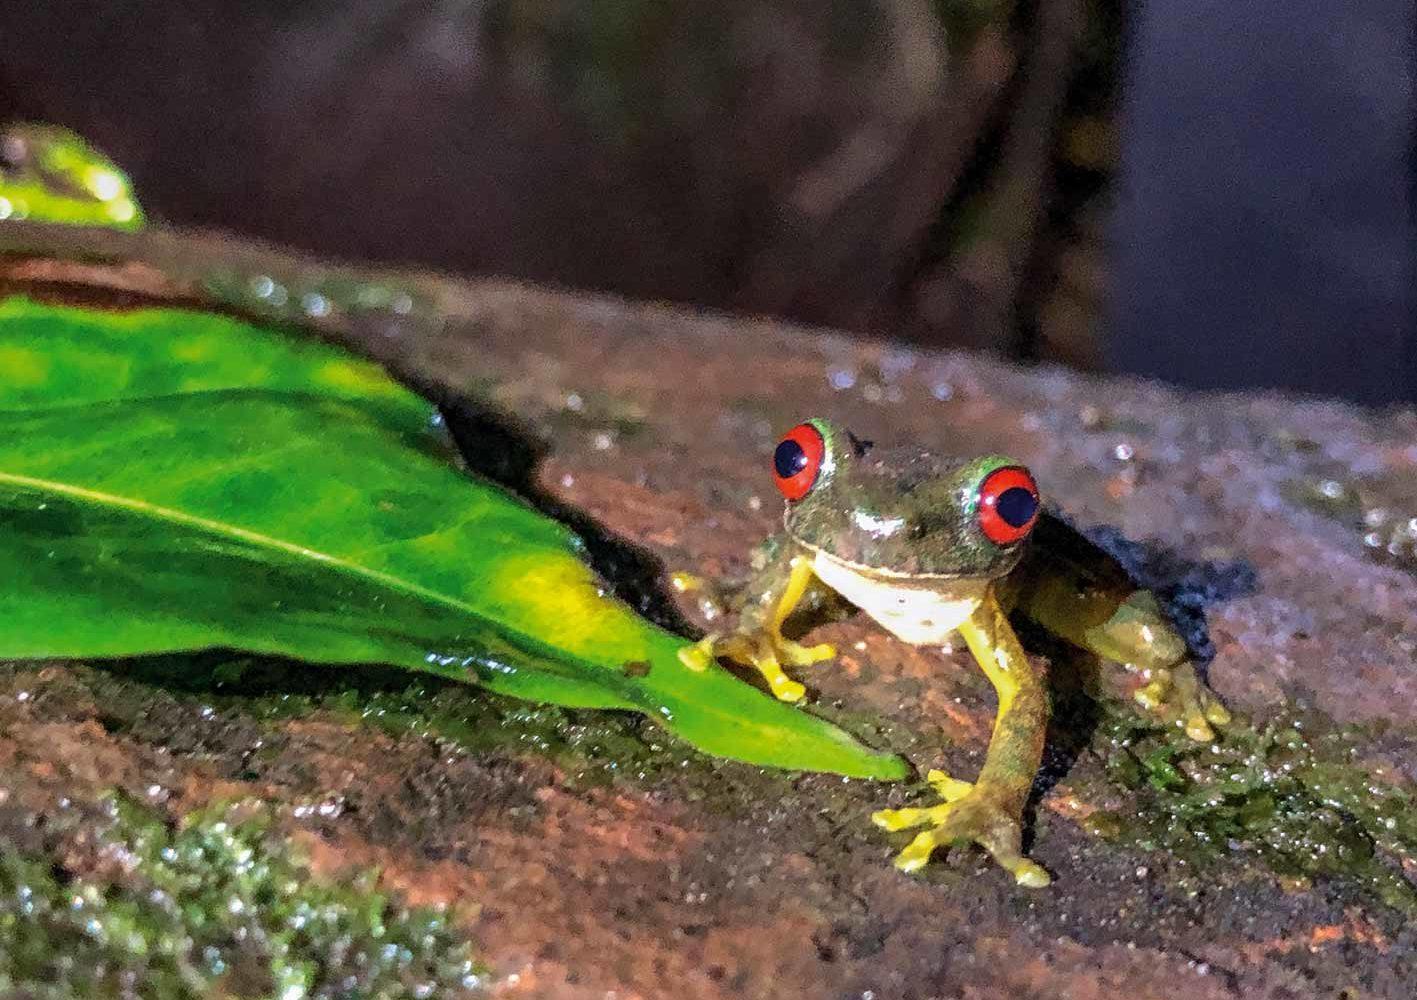 Rotaugenlaubfrosch im Monteverde-Nebelwald, Costa Rica